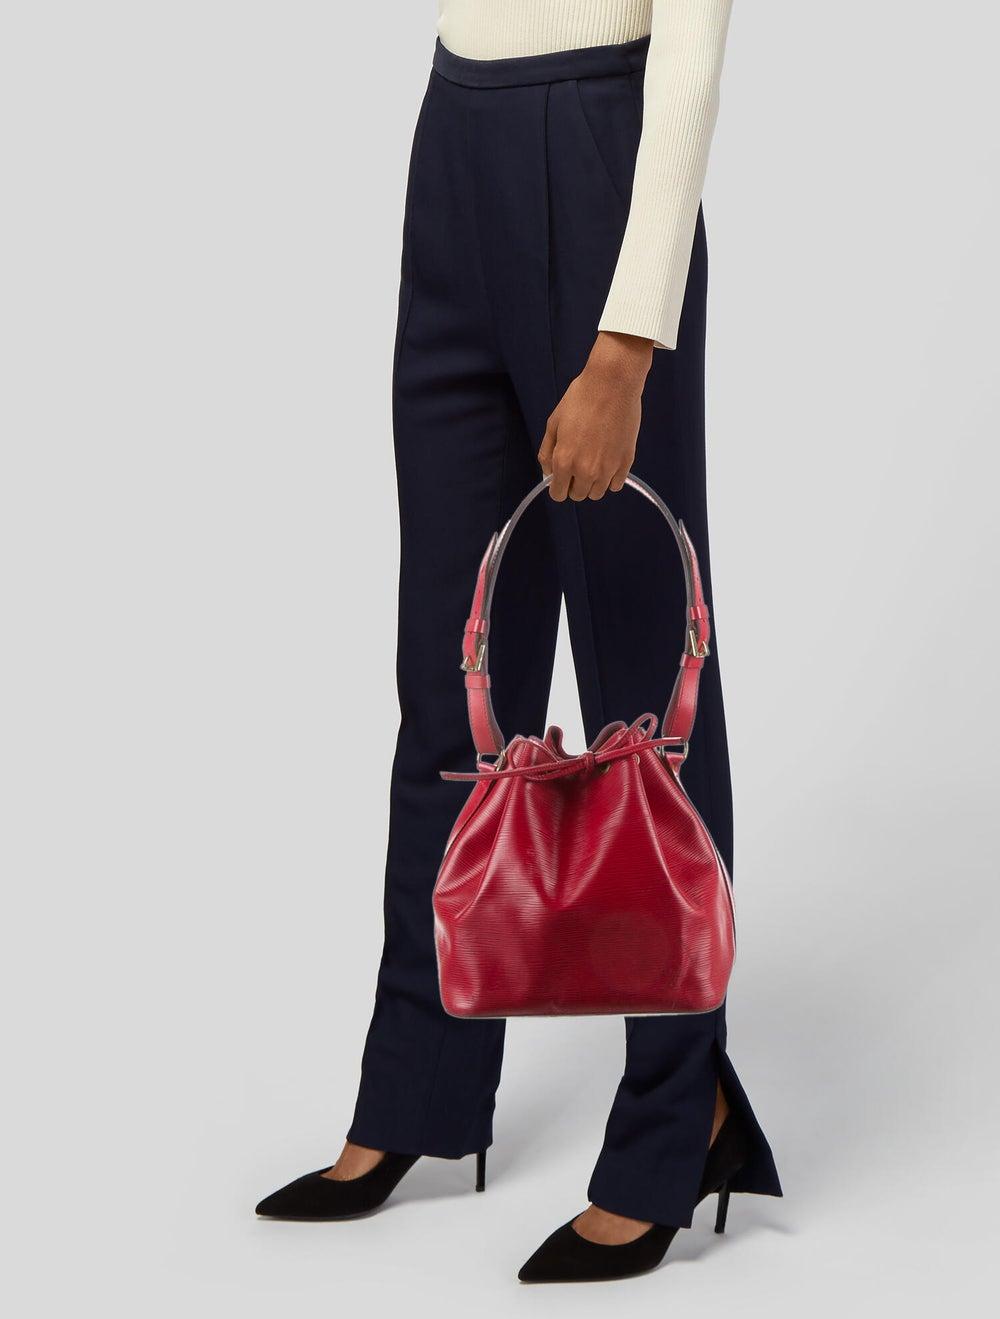 Louis Vuitton Vintage Epi Petit Noe Red - image 2